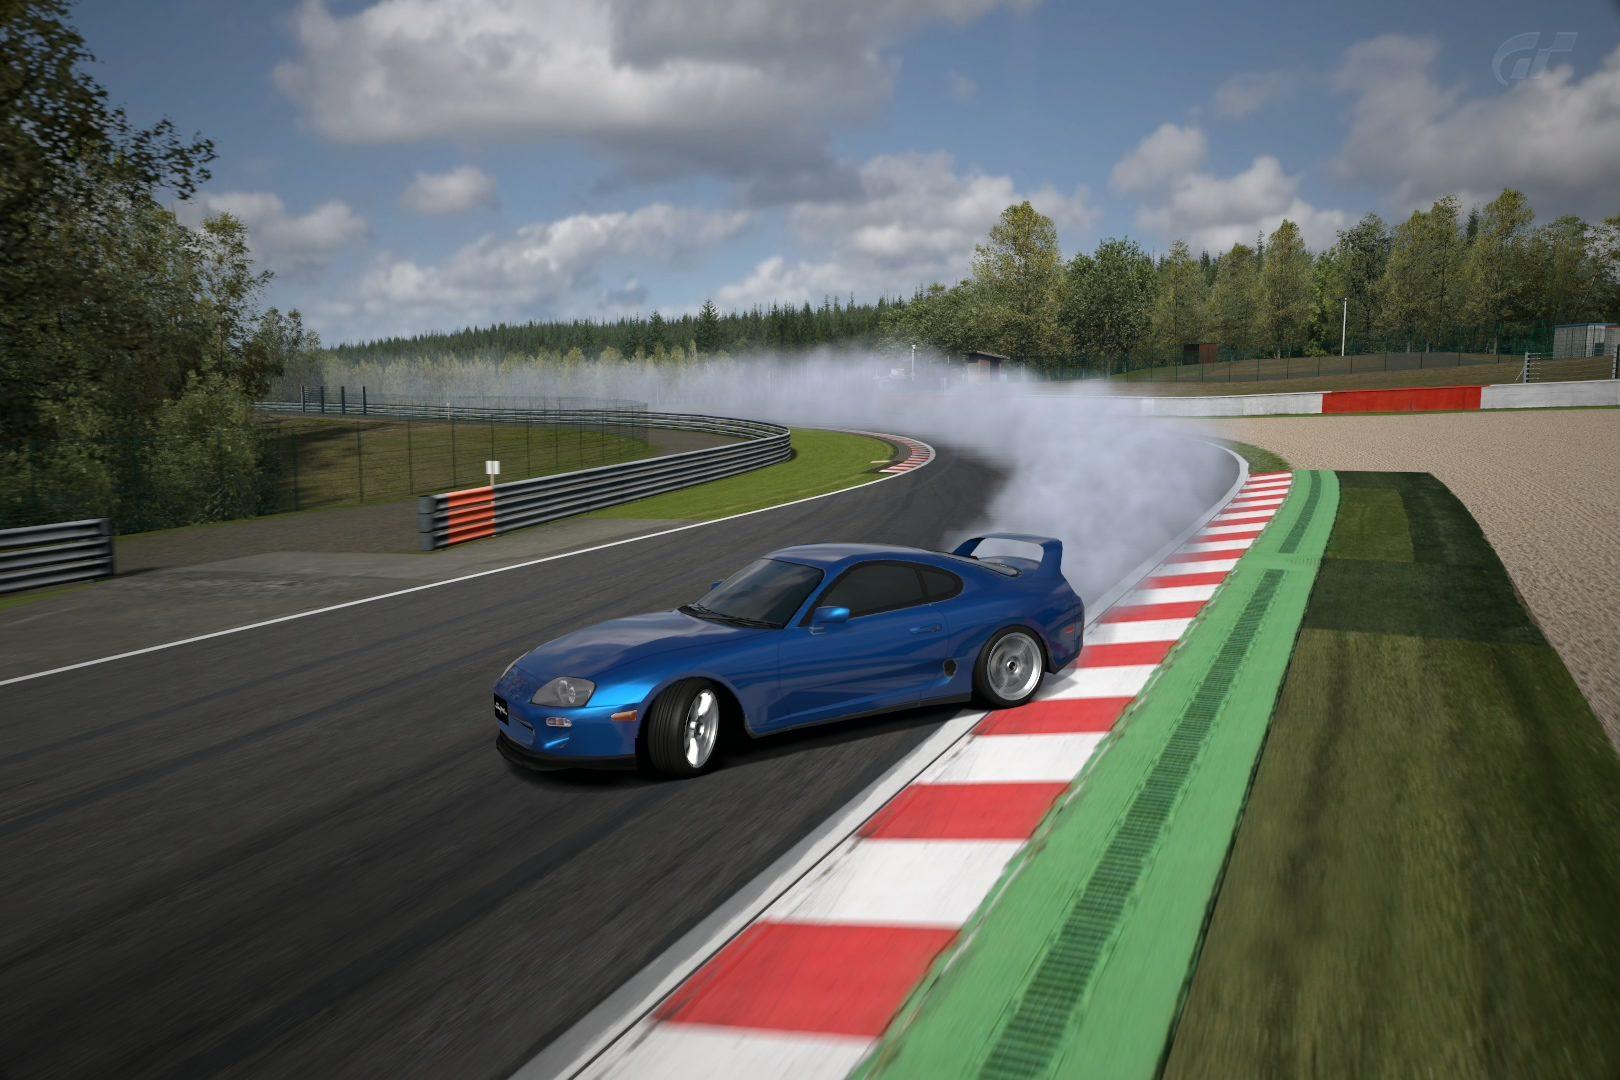 Circuit de Spa-Francorchamps_8.jpg